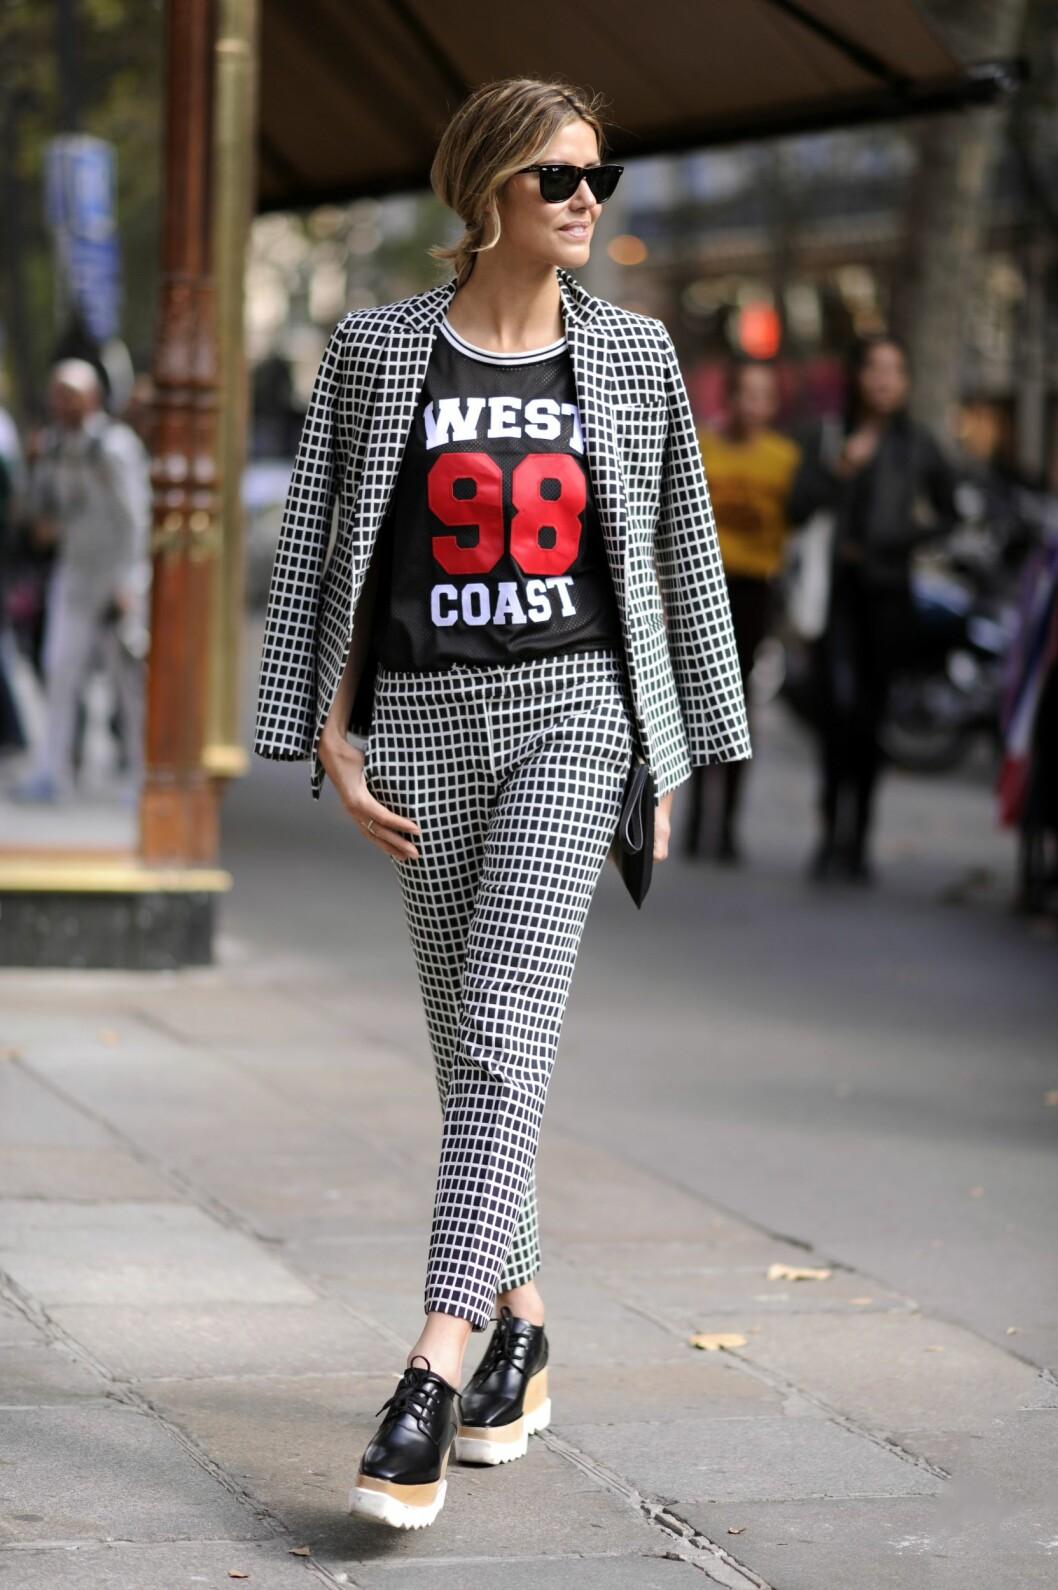 En mønstret dress kan kombineres med print for en sporty, hverdagslig look.  Foto: All Over